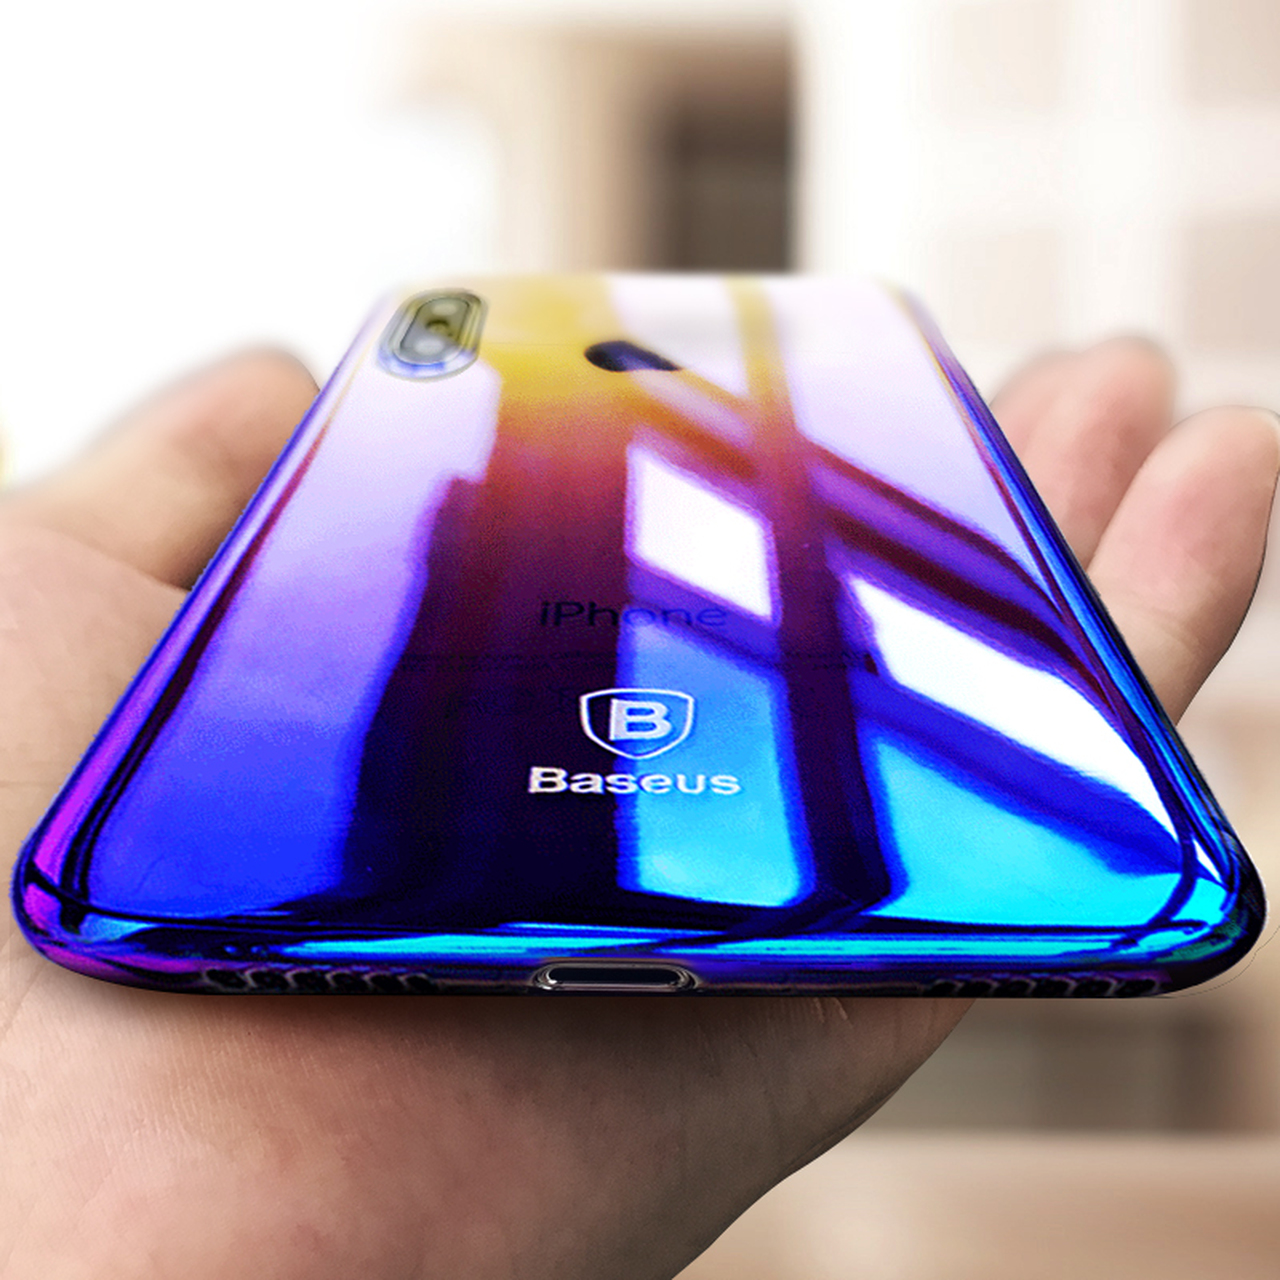 bc62c4ec7e Baseus Luxury Gradient Plastic Case For iPhone X Coque Fashion Blue Ray  Light Plating Hard Case ...